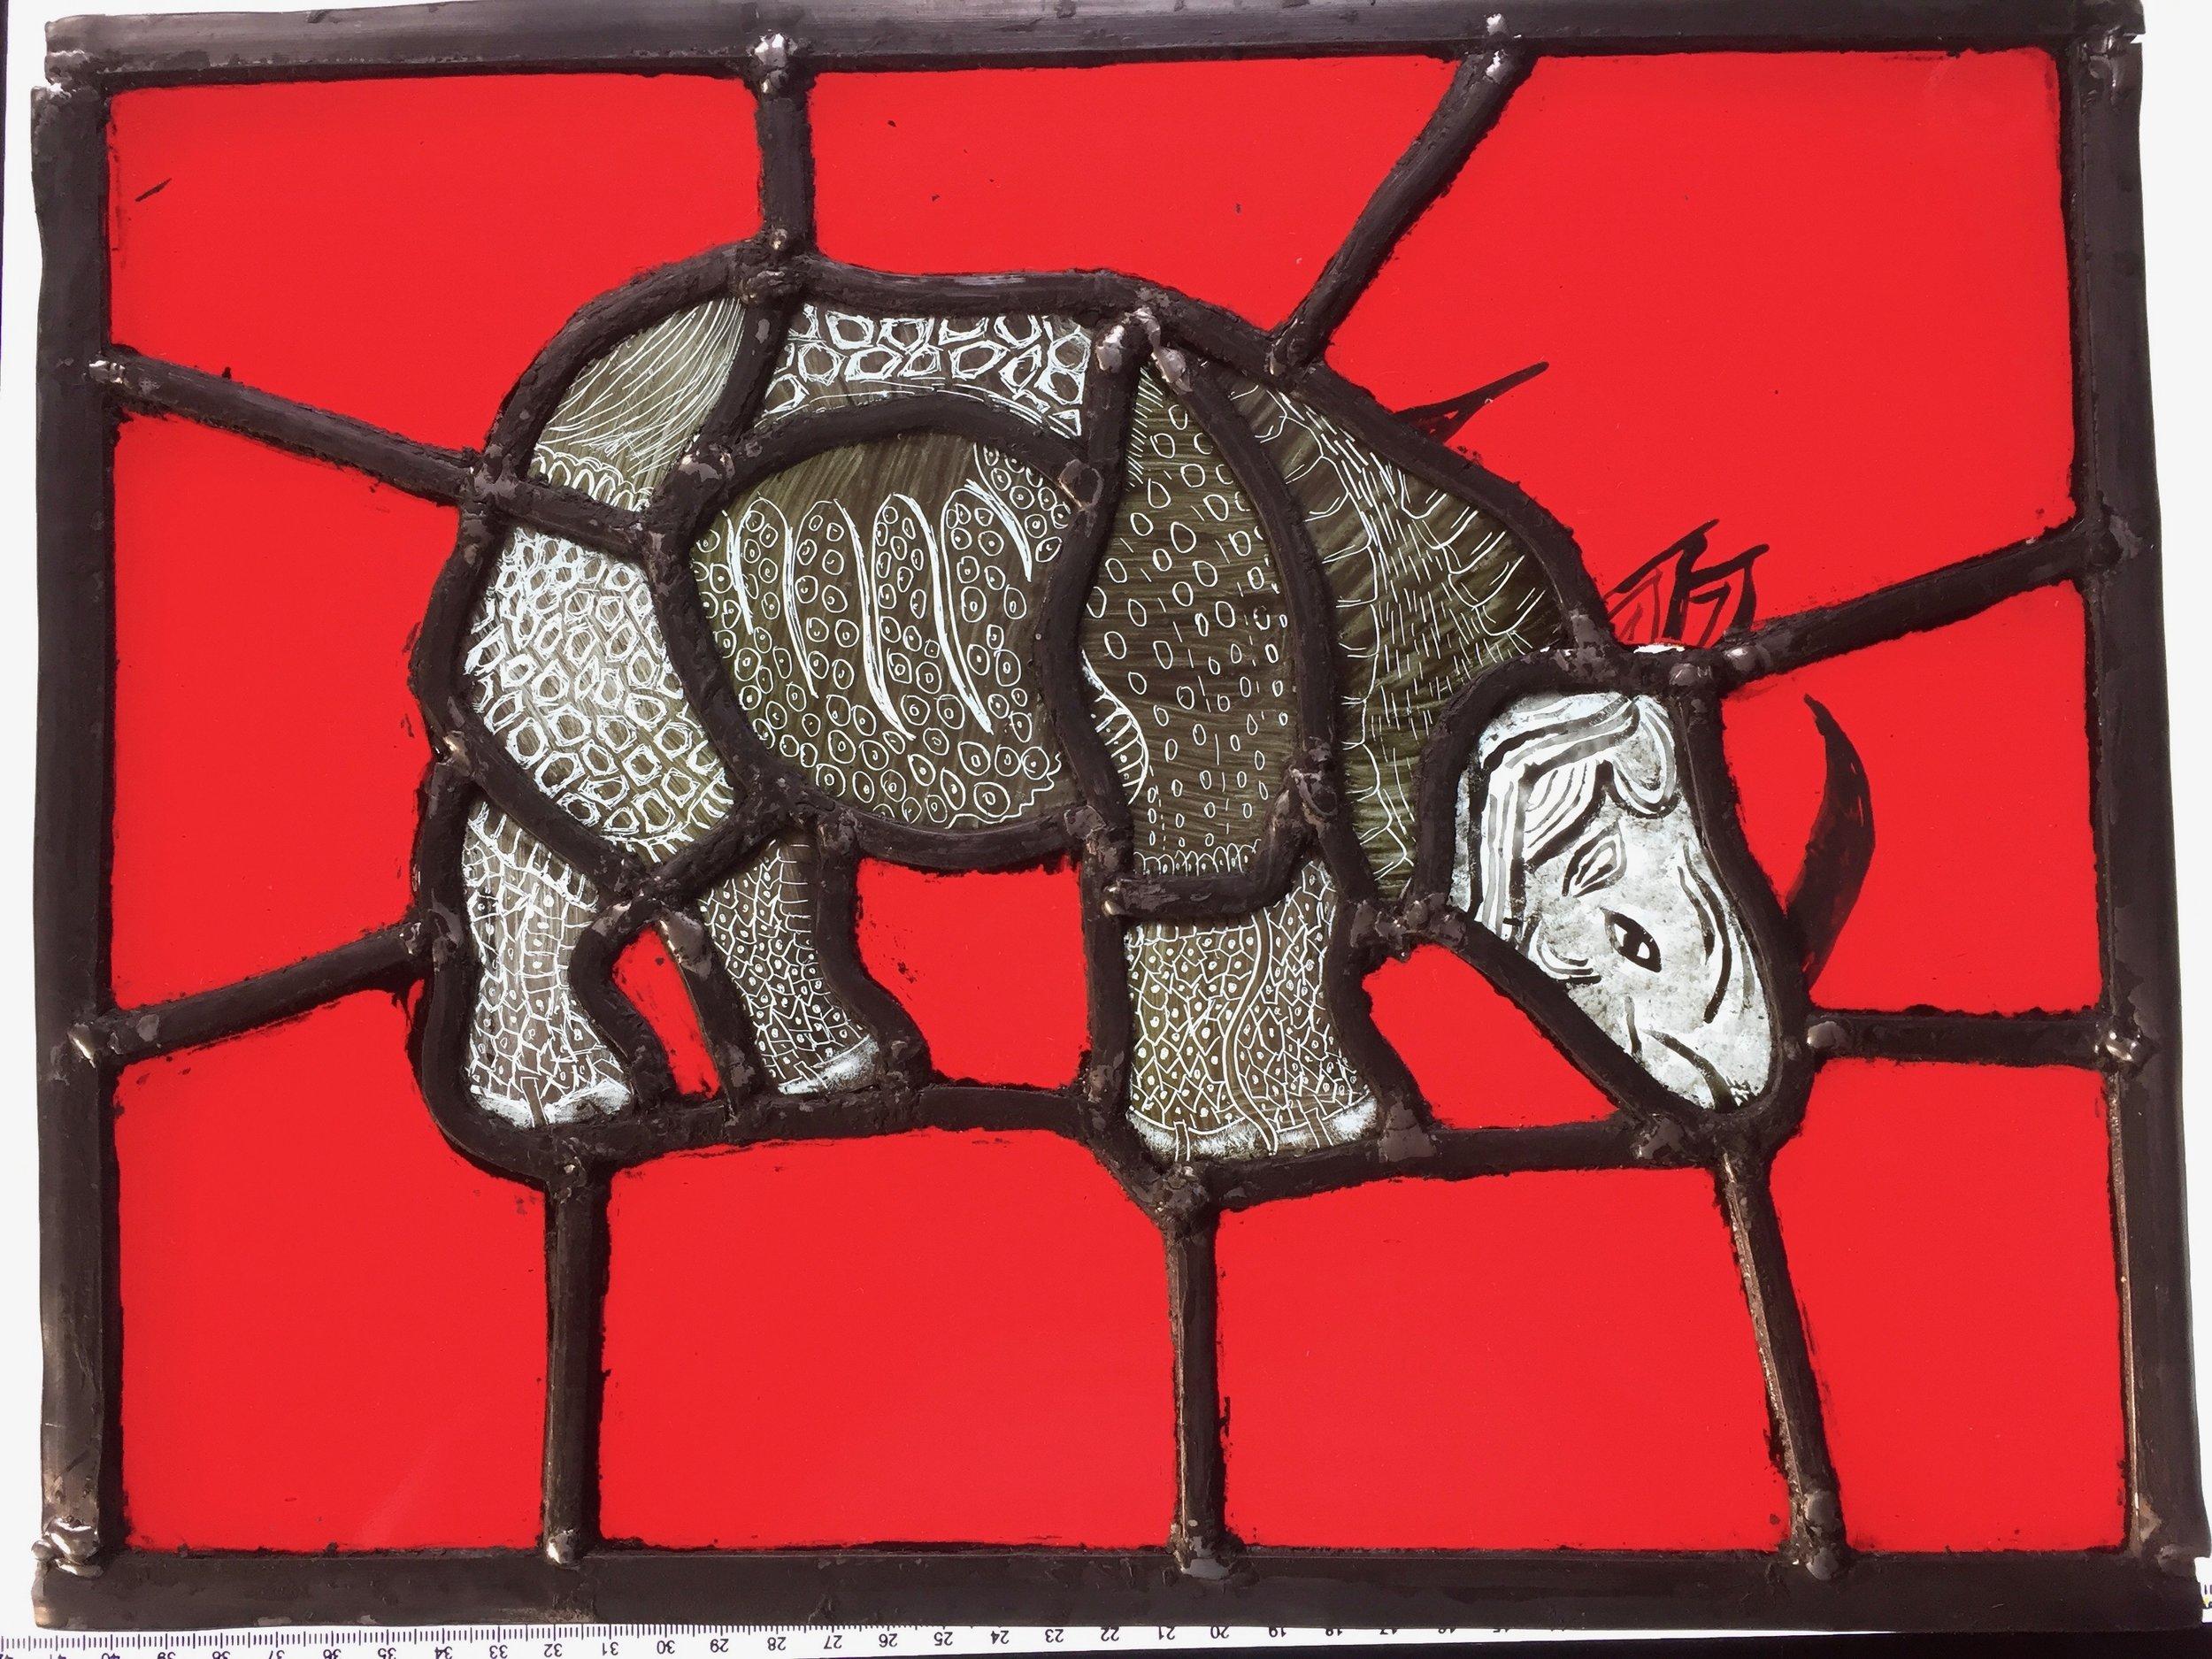 Ronnie Rhino